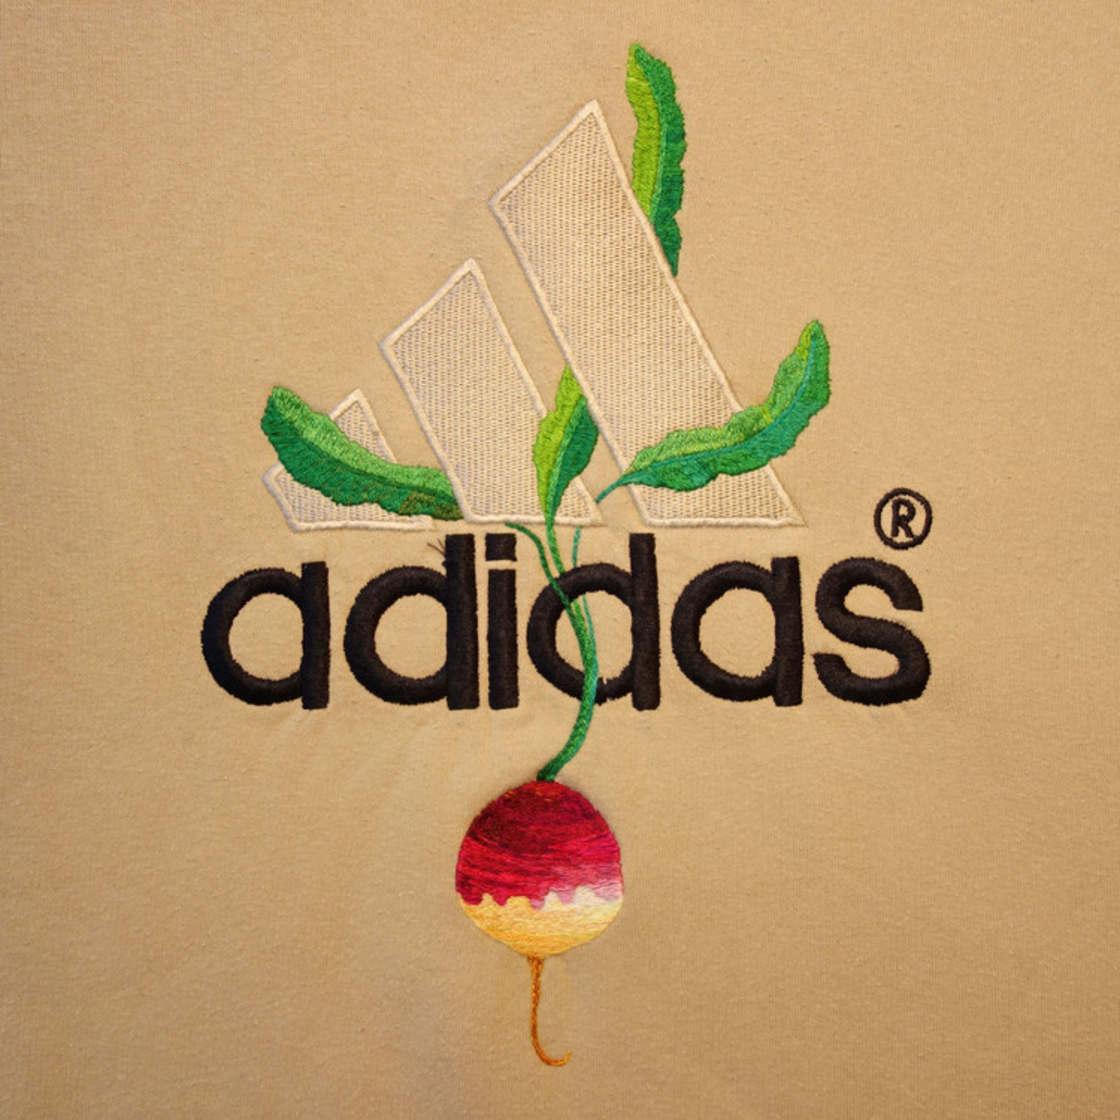 logossportbrands7